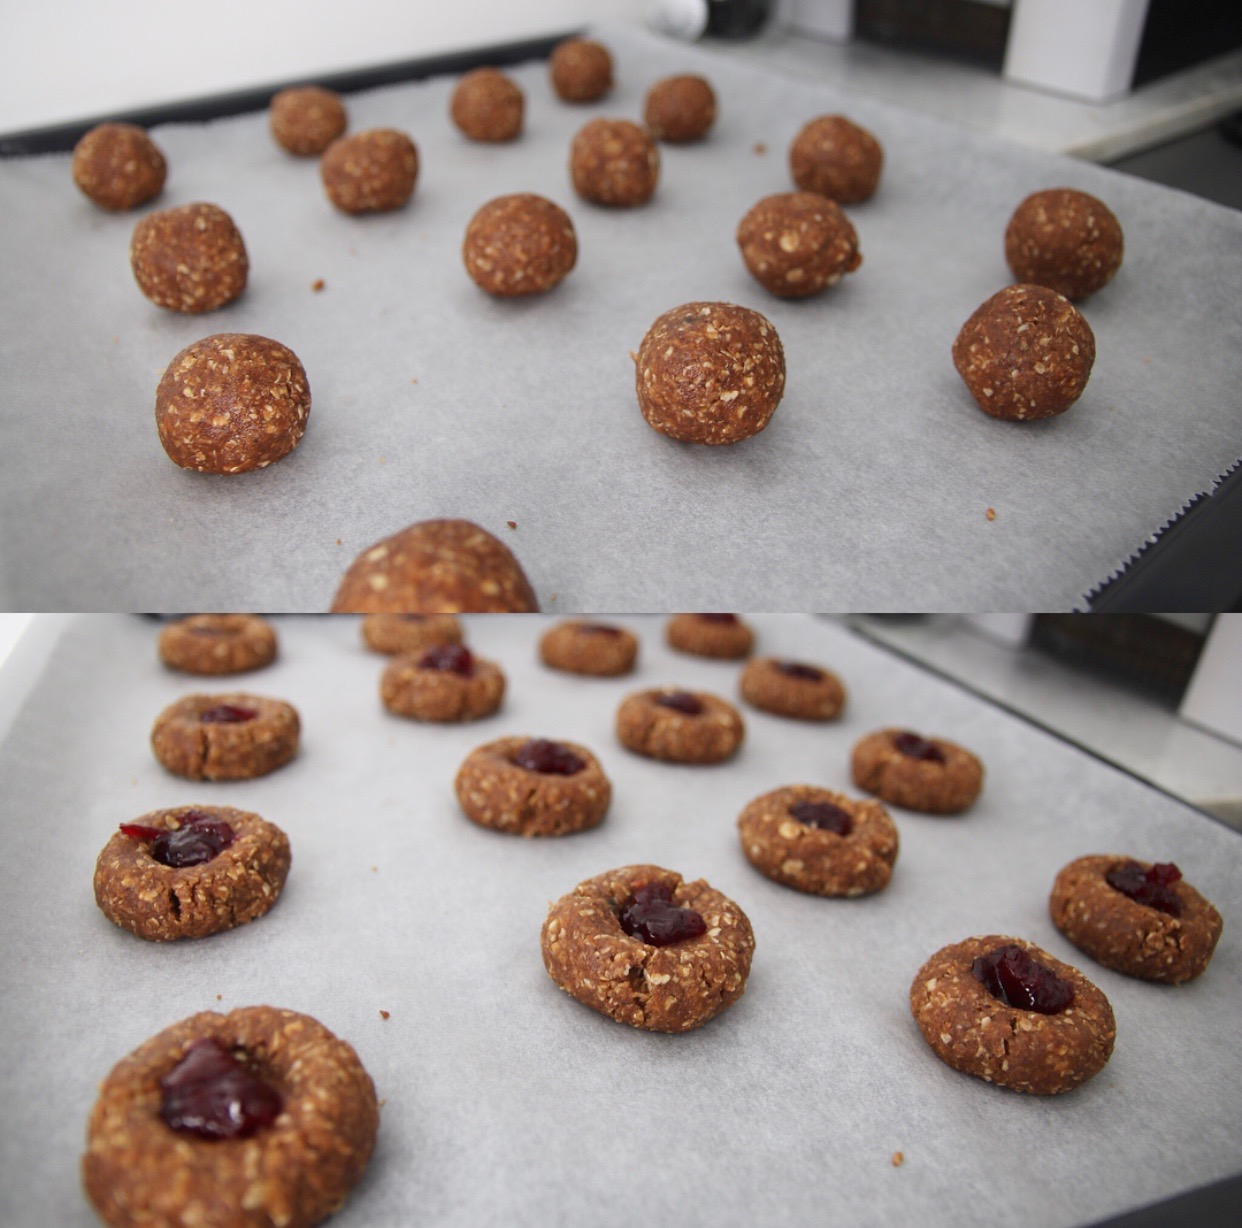 Pinda koekje making